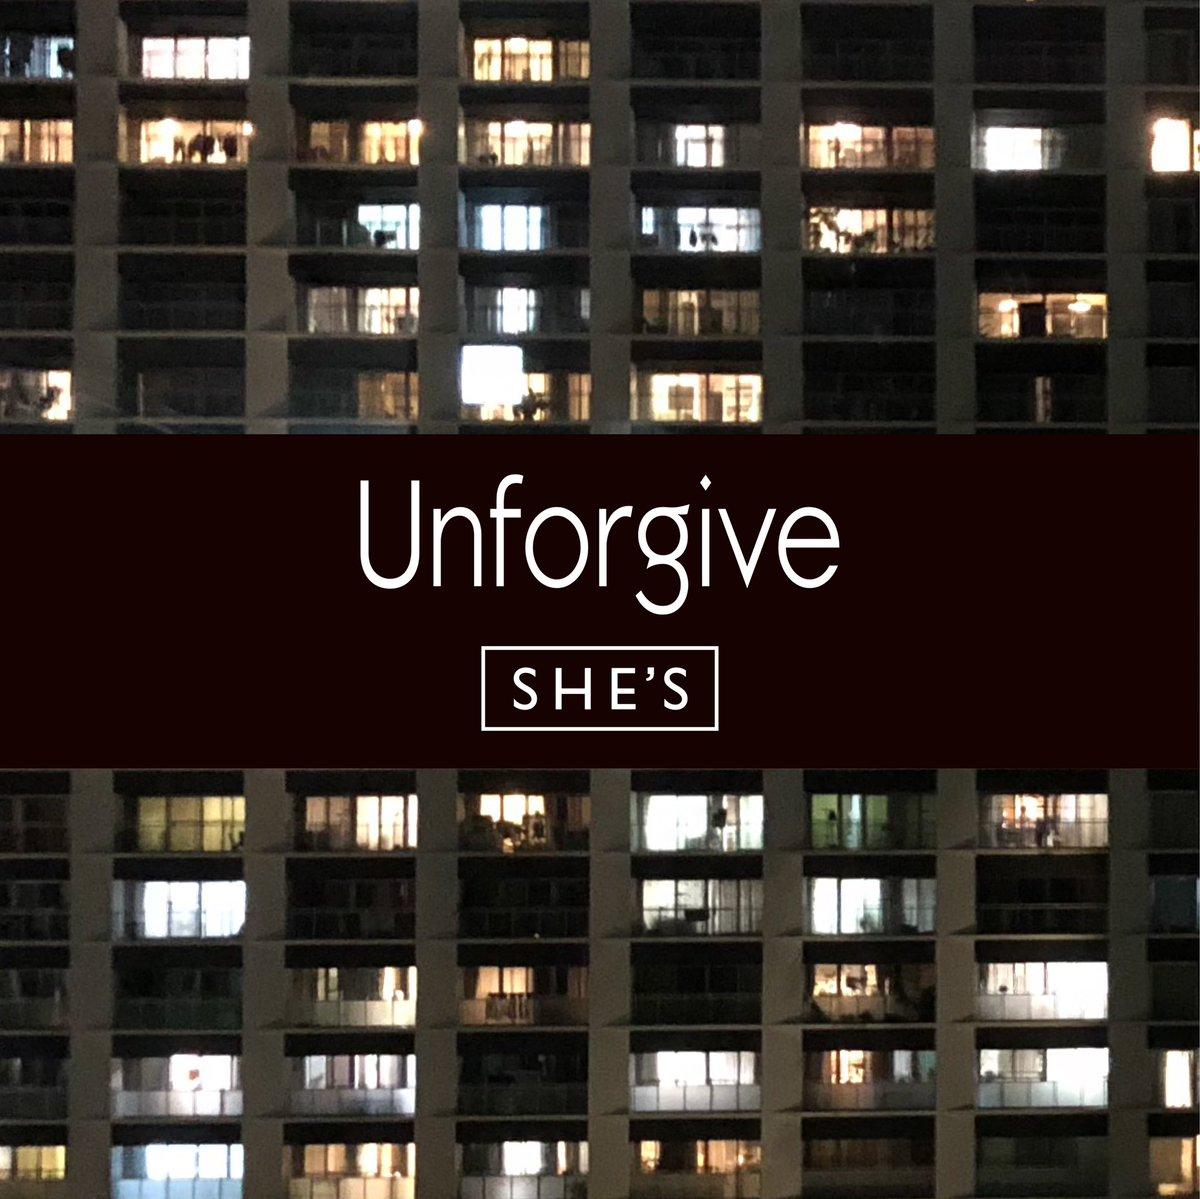 🎧Spotify🎧ドラマ特区「ホームルーム」OP主題歌👿SHE'S「Unforgive」⏬J-Rock Now🎸選曲していただきました🎊是非チェックお願い致します🙇♂#Spotify @SpotifyJP#SHE_S #Unforgive#ホームルーム @homeroom_drama